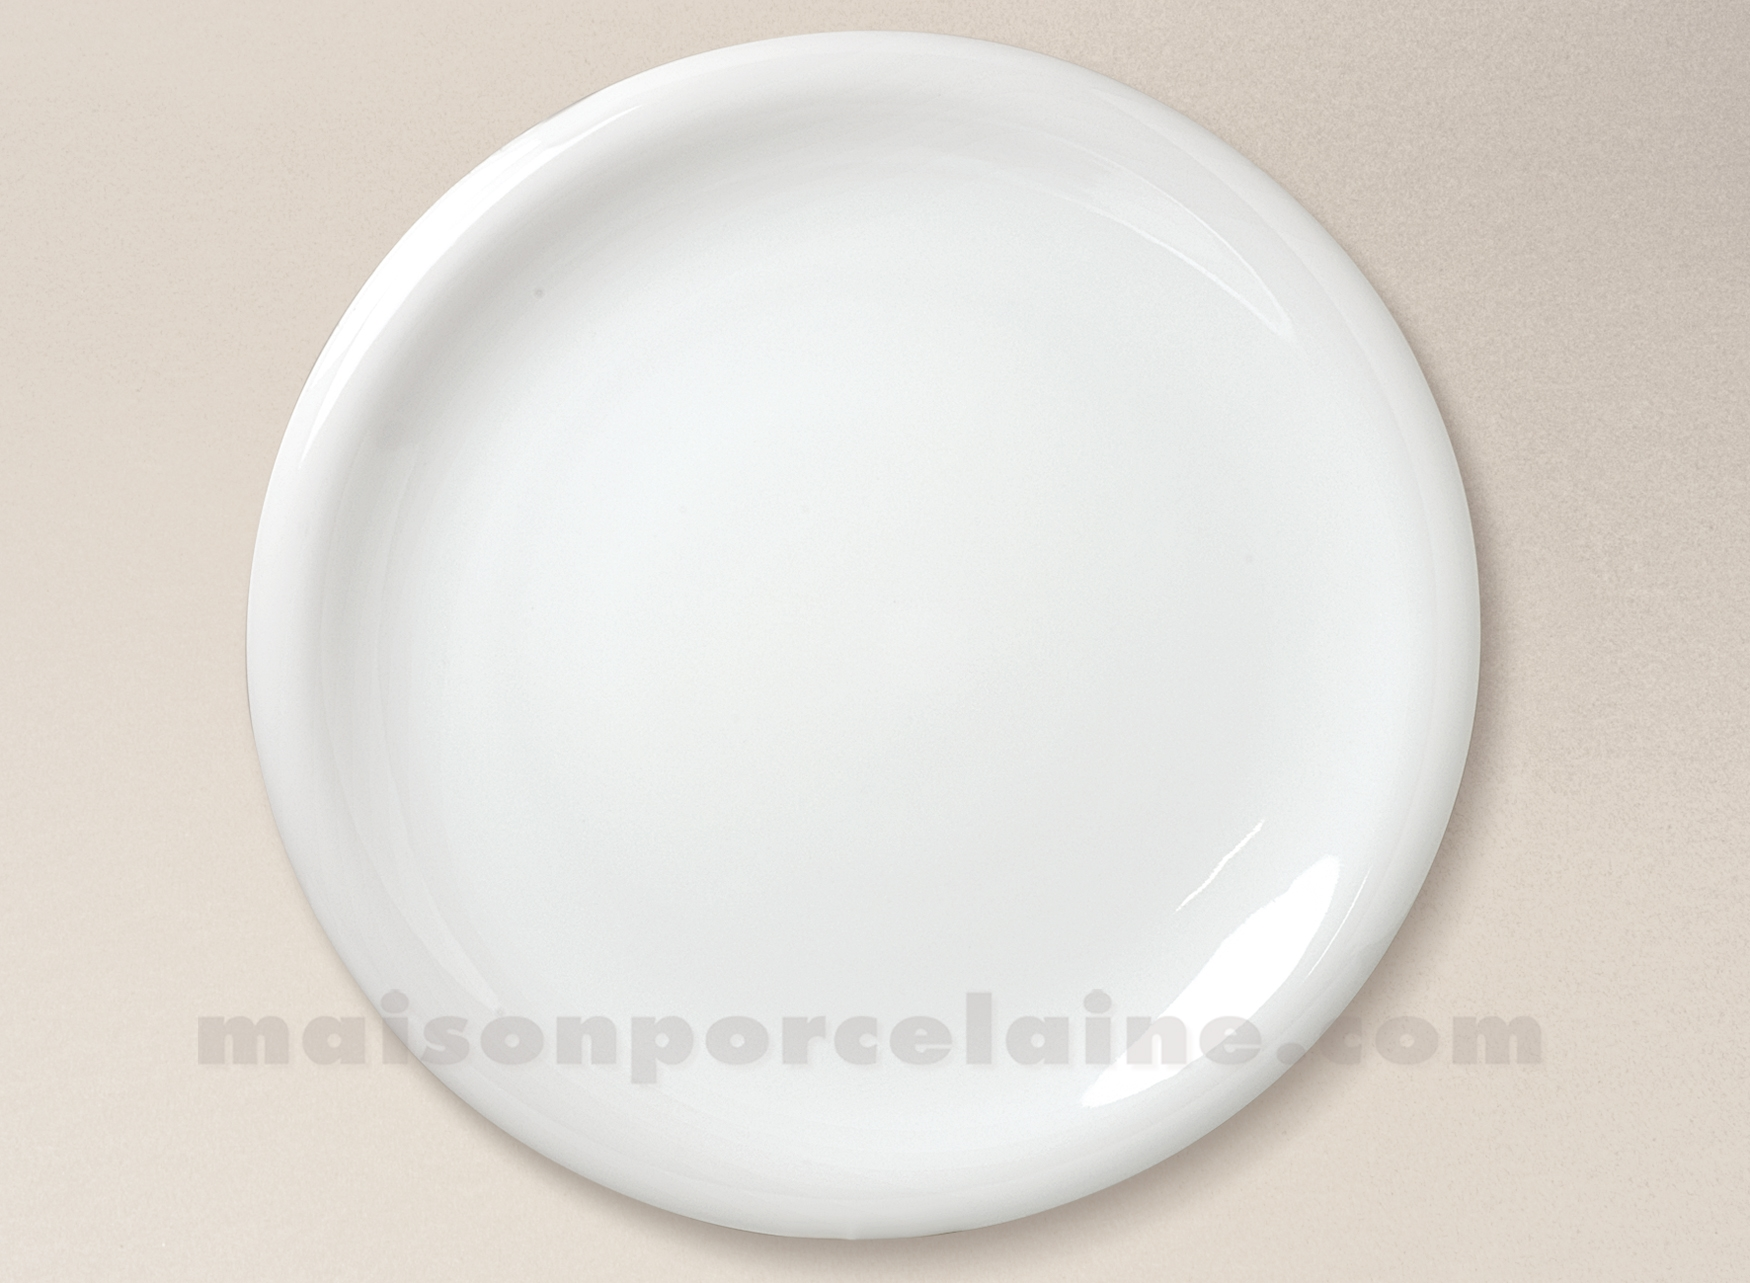 assiette presentation porcelaine blanche ronda d31 5. Black Bedroom Furniture Sets. Home Design Ideas